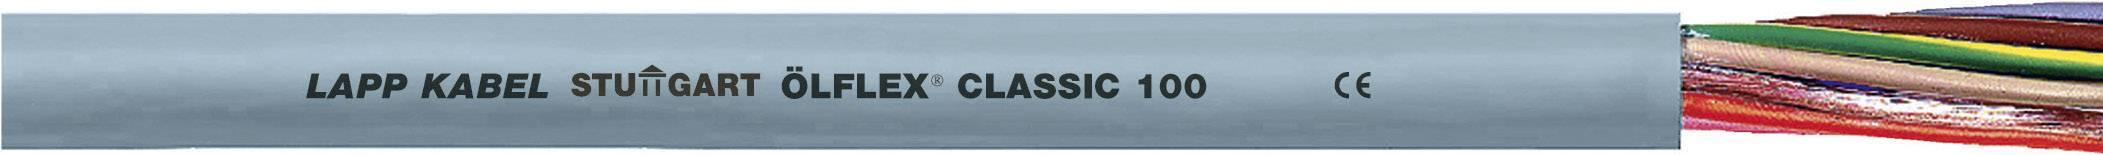 Kabel LappKabel Ölflex CLASSIC 100 3X0,75 (00101254), PVC, 5,7 mm, 500 V, šedá, 1000 m